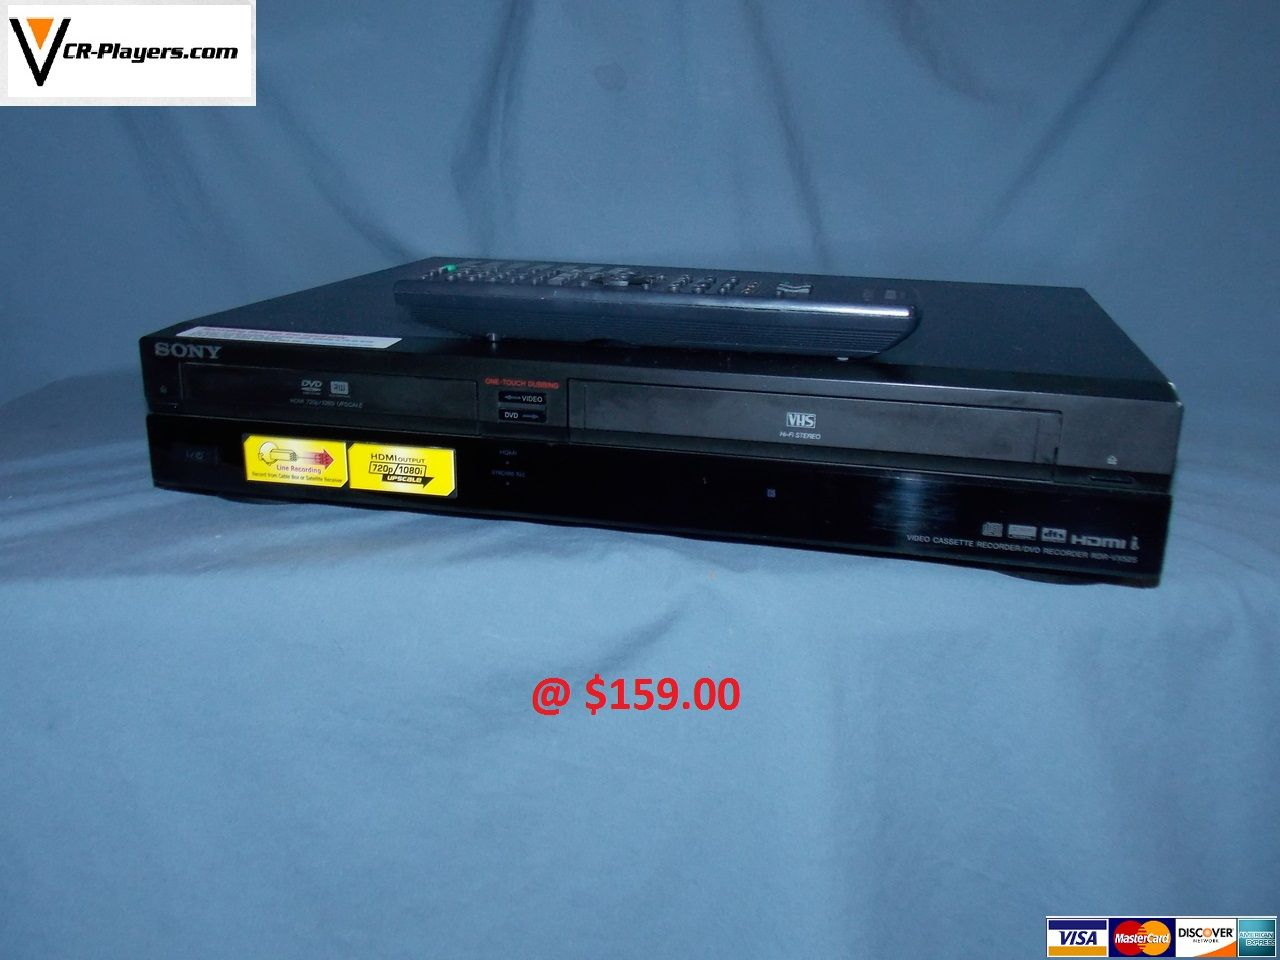 sony rdr vx525 hdmi dvd recorder vhs vcr combo player copy vhs to rh pinterest com Sony DVD VHS Recorder Combo Machine sony rdr-vx530 dvd recorder & vhs combo player manual